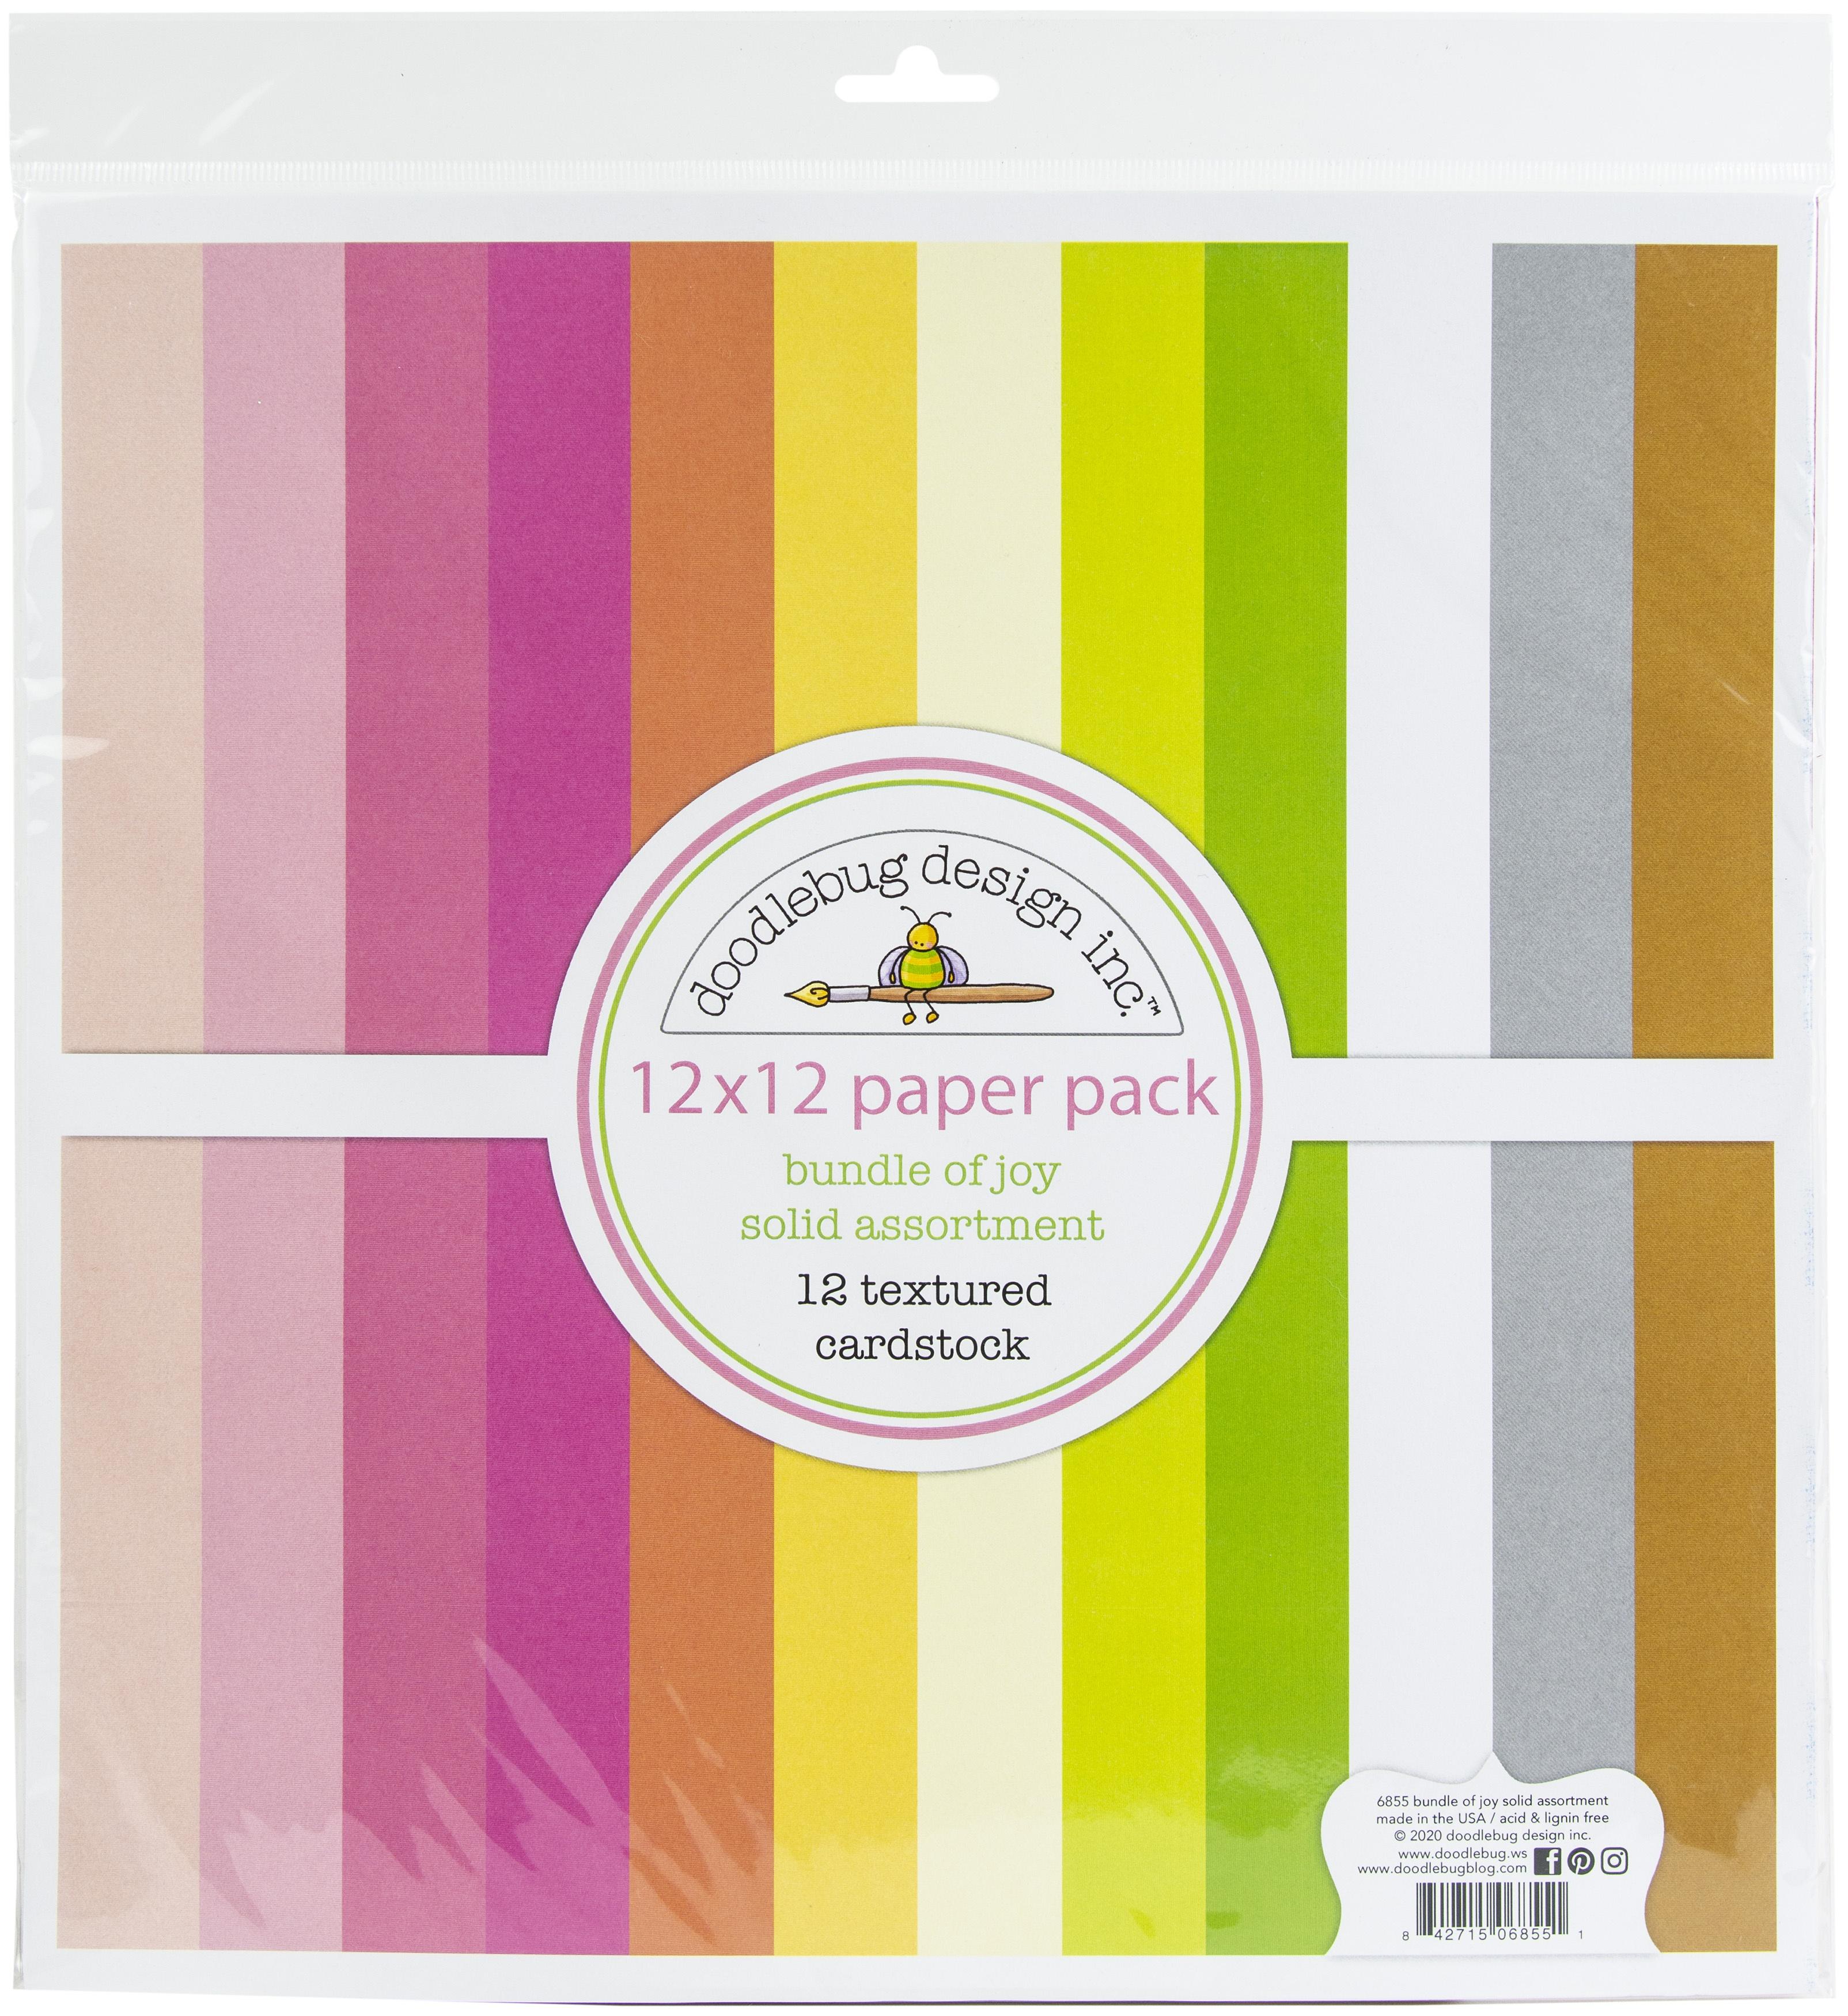 Bundle of Joy Textured Cardstock Pack